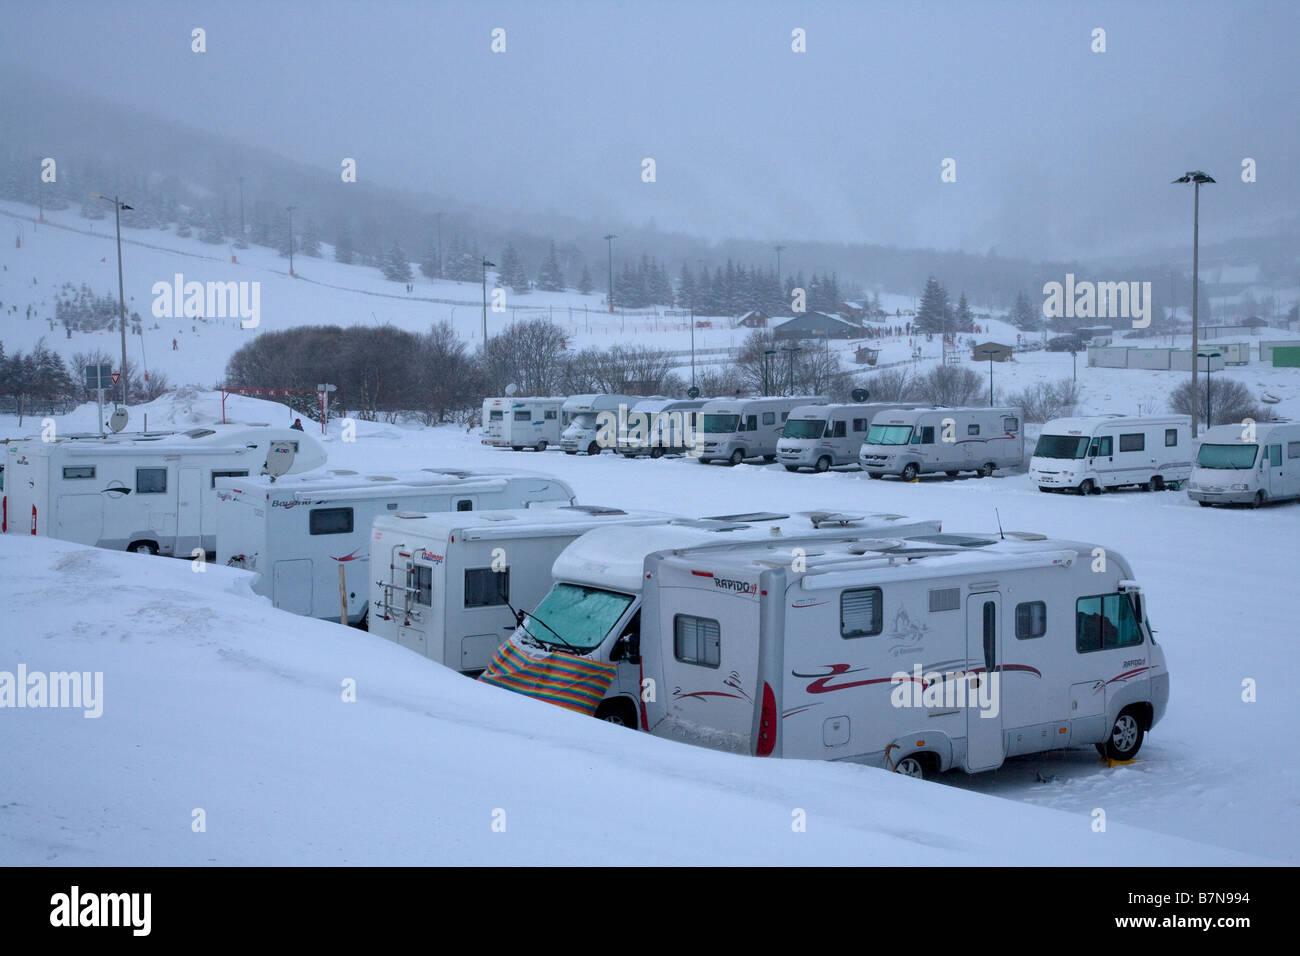 R V Motorhomes In Caravan Park In Winter Snow Super